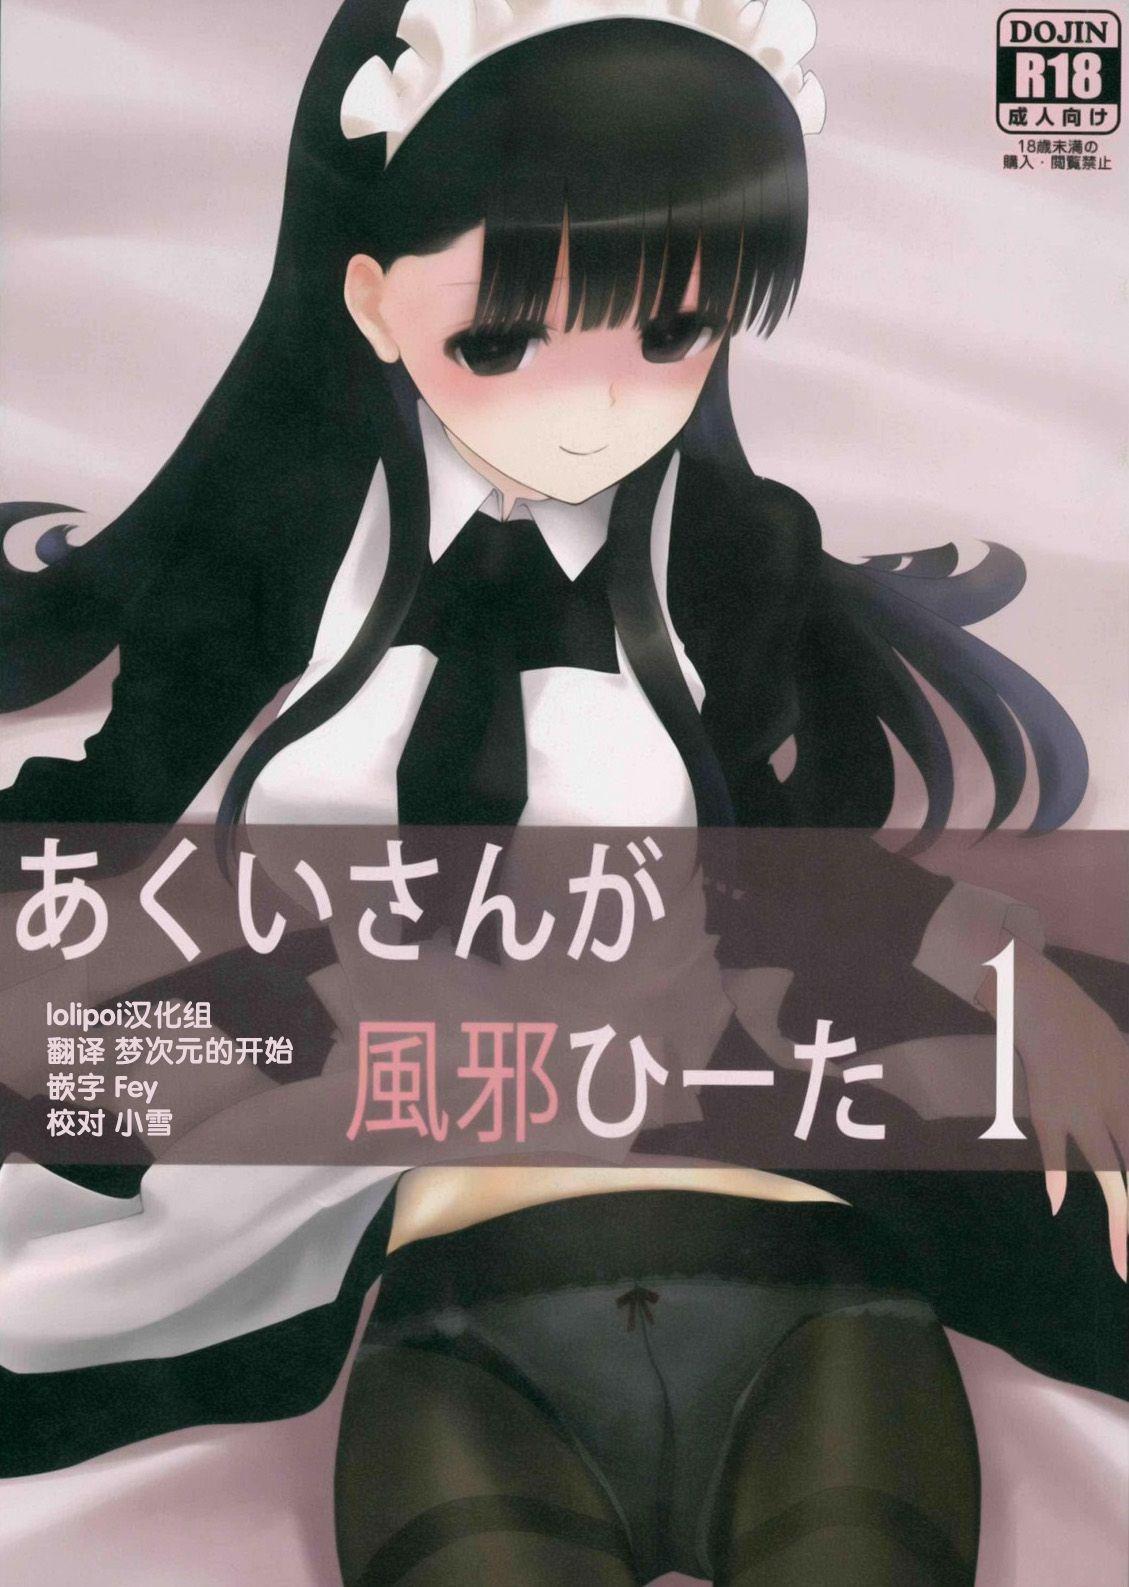 [Heikoushihenkei (Kawanakajima)] Akui-san ga Kaze hi-ta 1 [Chinese] [lolipoi汉化组] [2014-06-10] 0